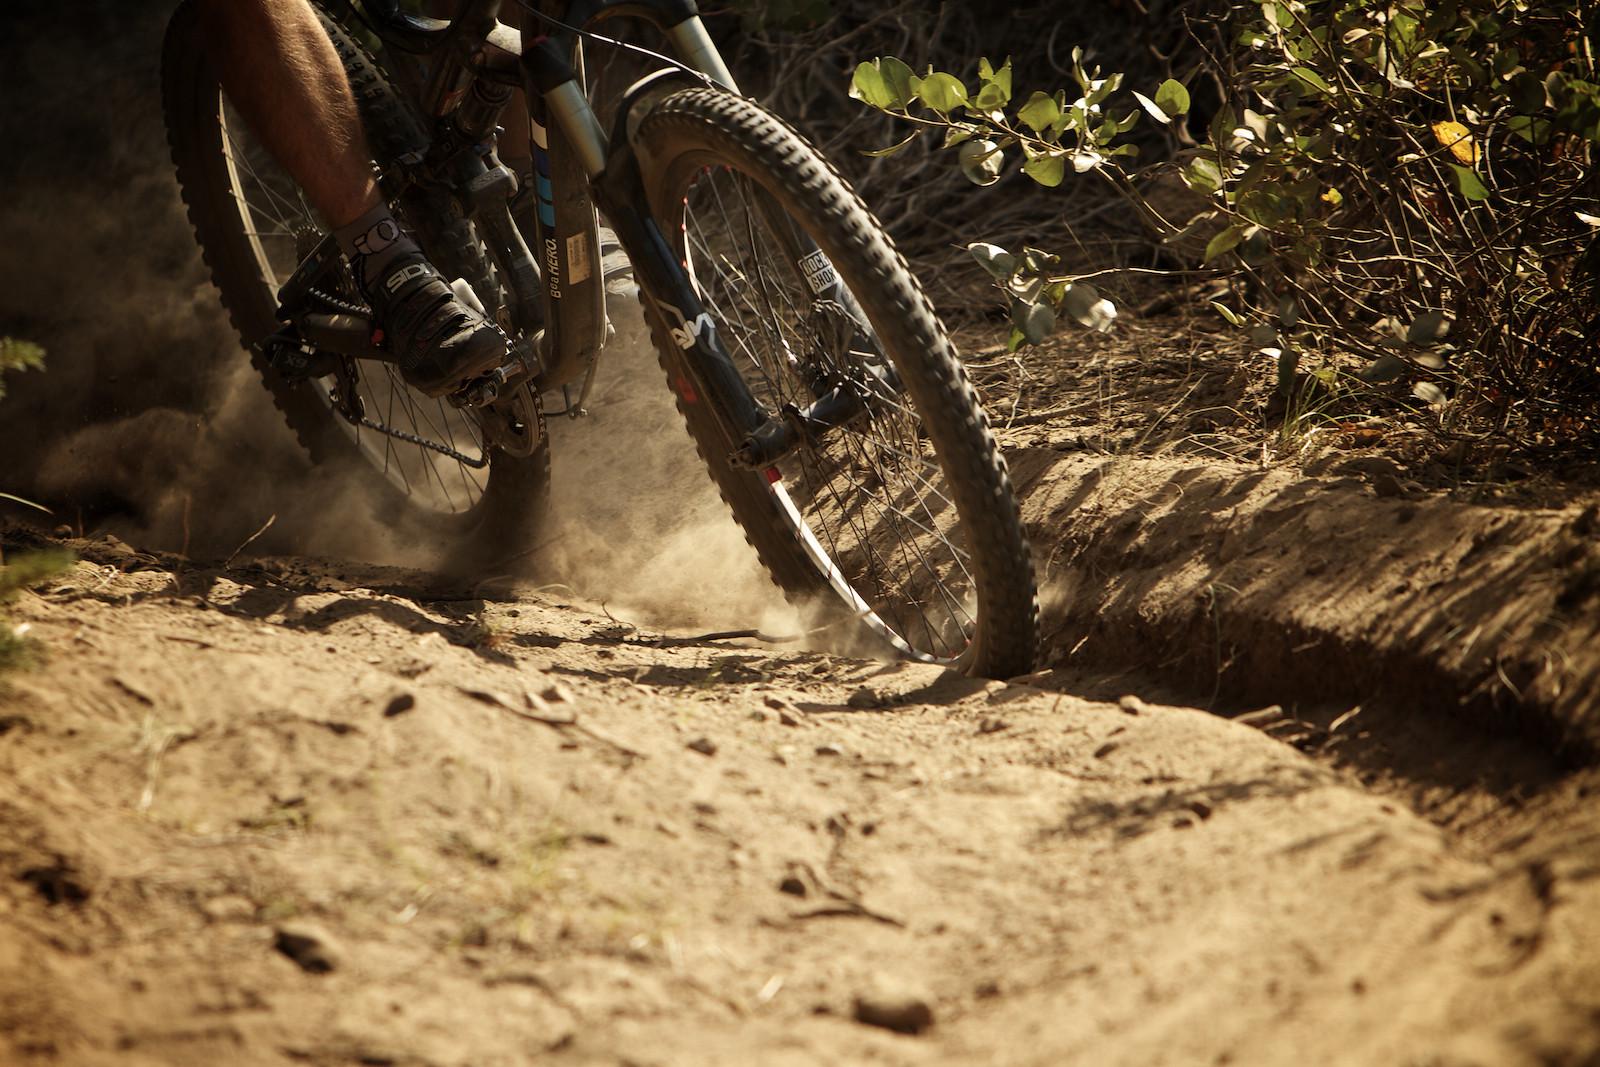 2012 Sisters Enduro Ruts - corytepper.com - Mountain Biking Pictures - Vital MTB